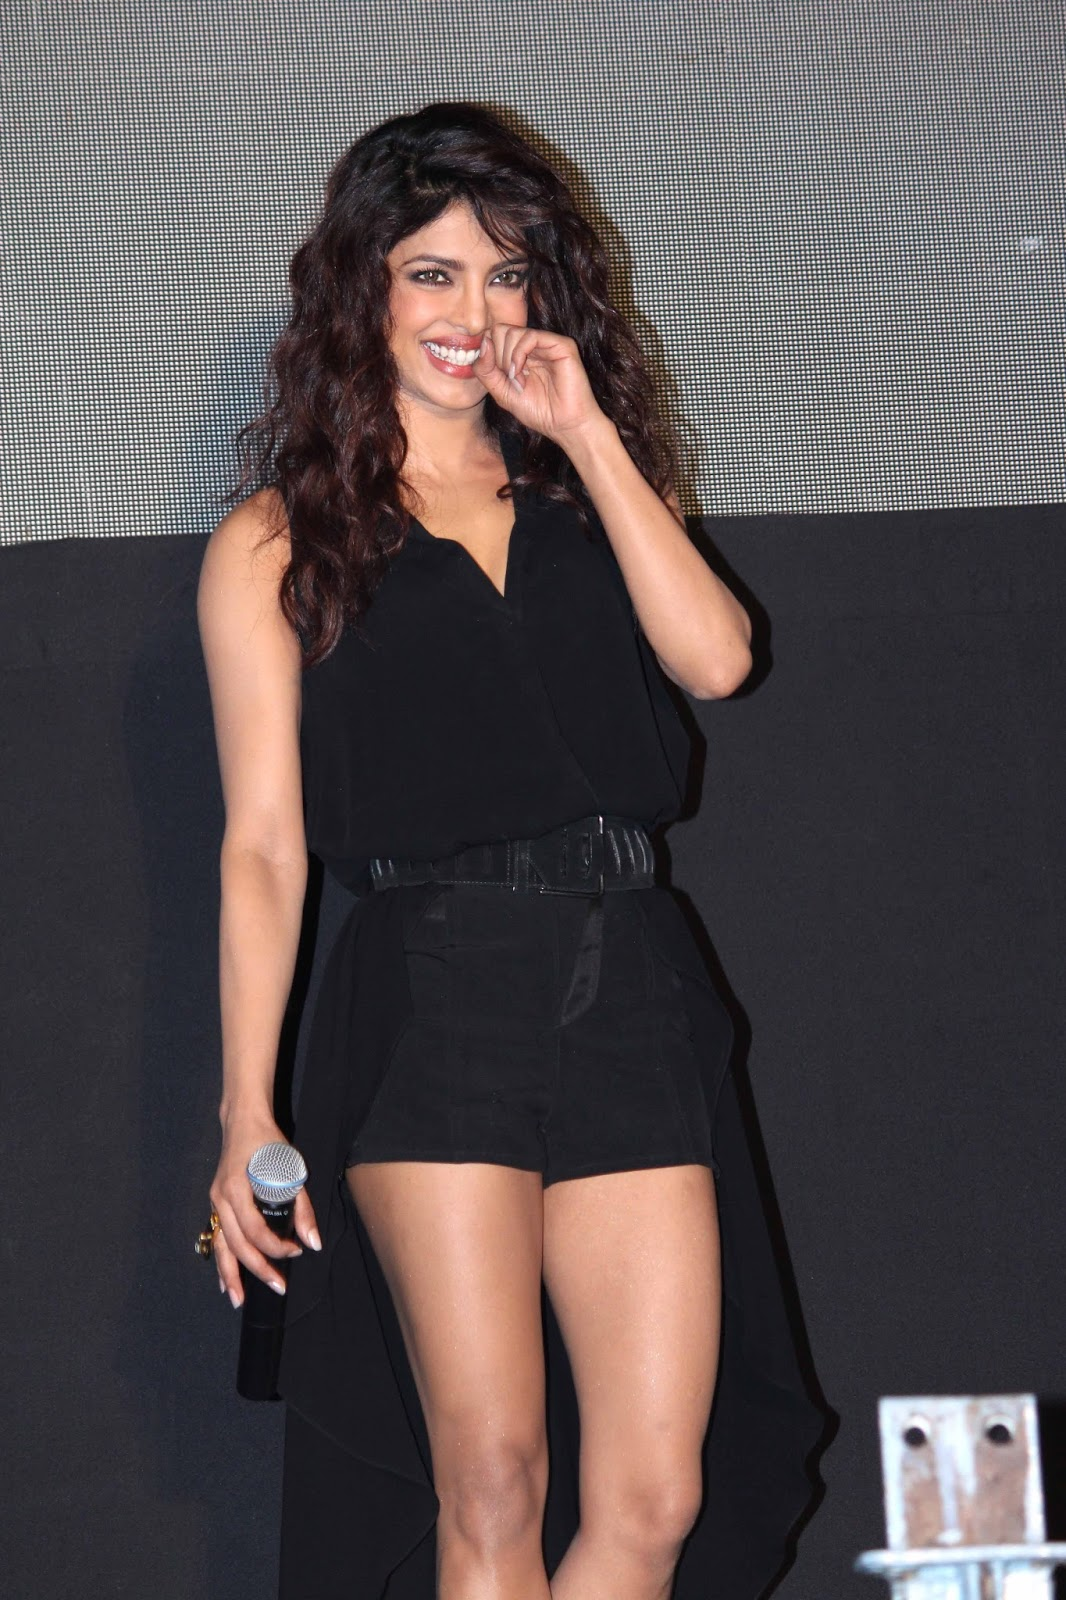 Priyanka Chopra Hot Legs Show Photos In Black Dress